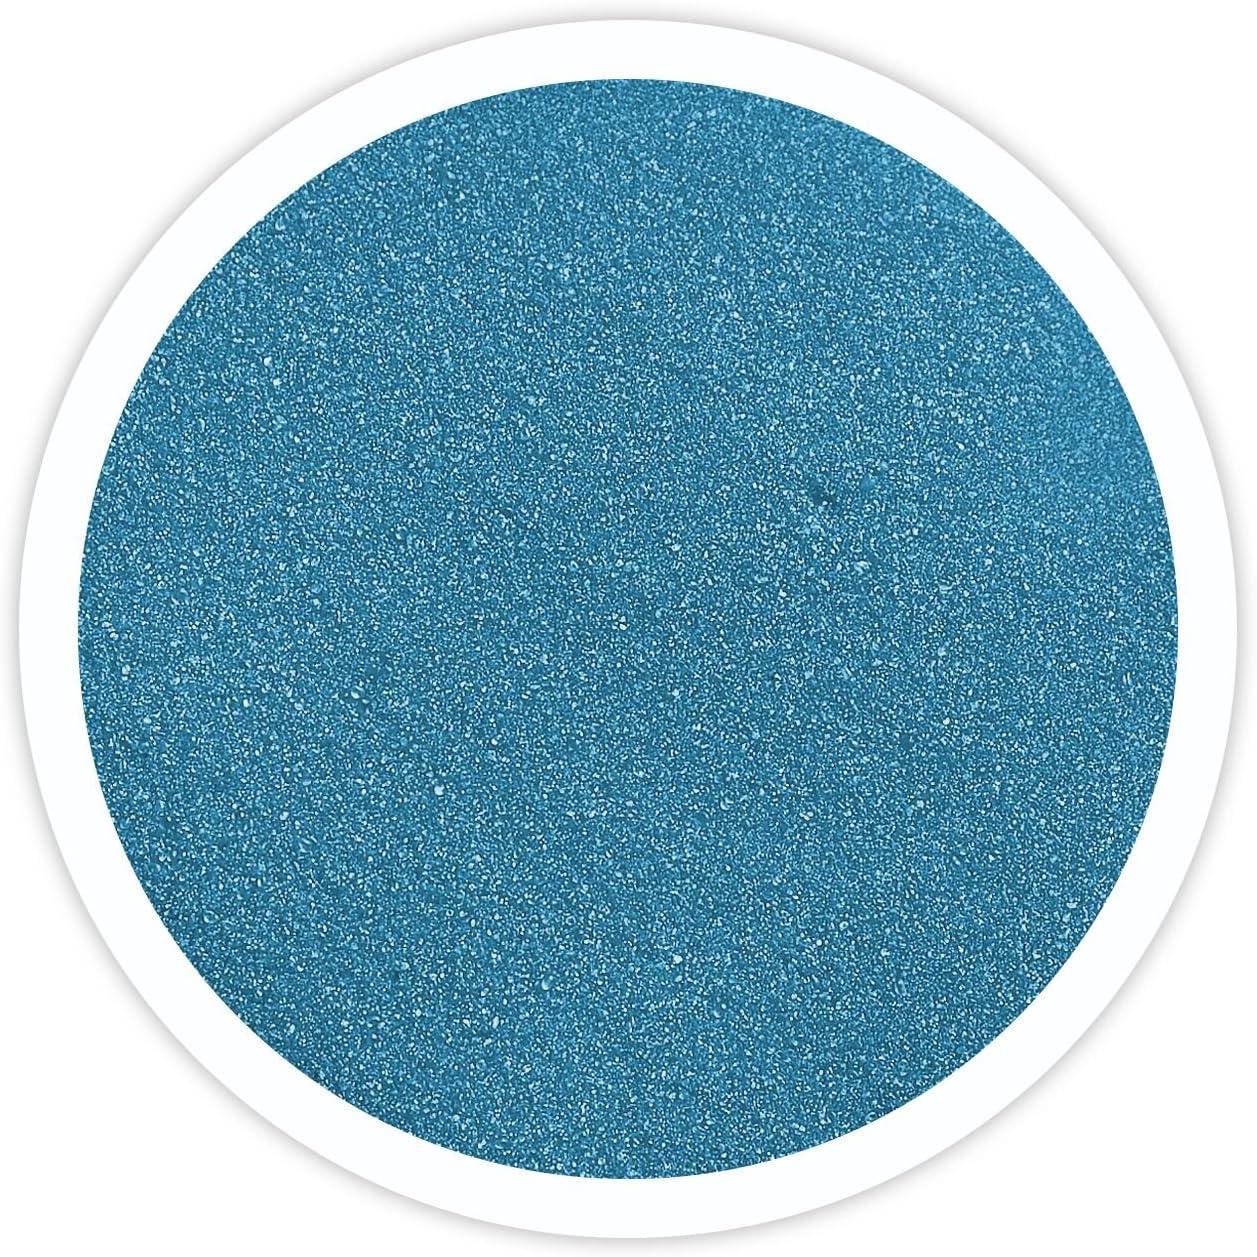 Sandsational Cornflower Blue Unity Sand~1.5 lbs (22 oz), Blue Colored Sand for Weddings, Vase Filler, Home Décor, Craft Sand